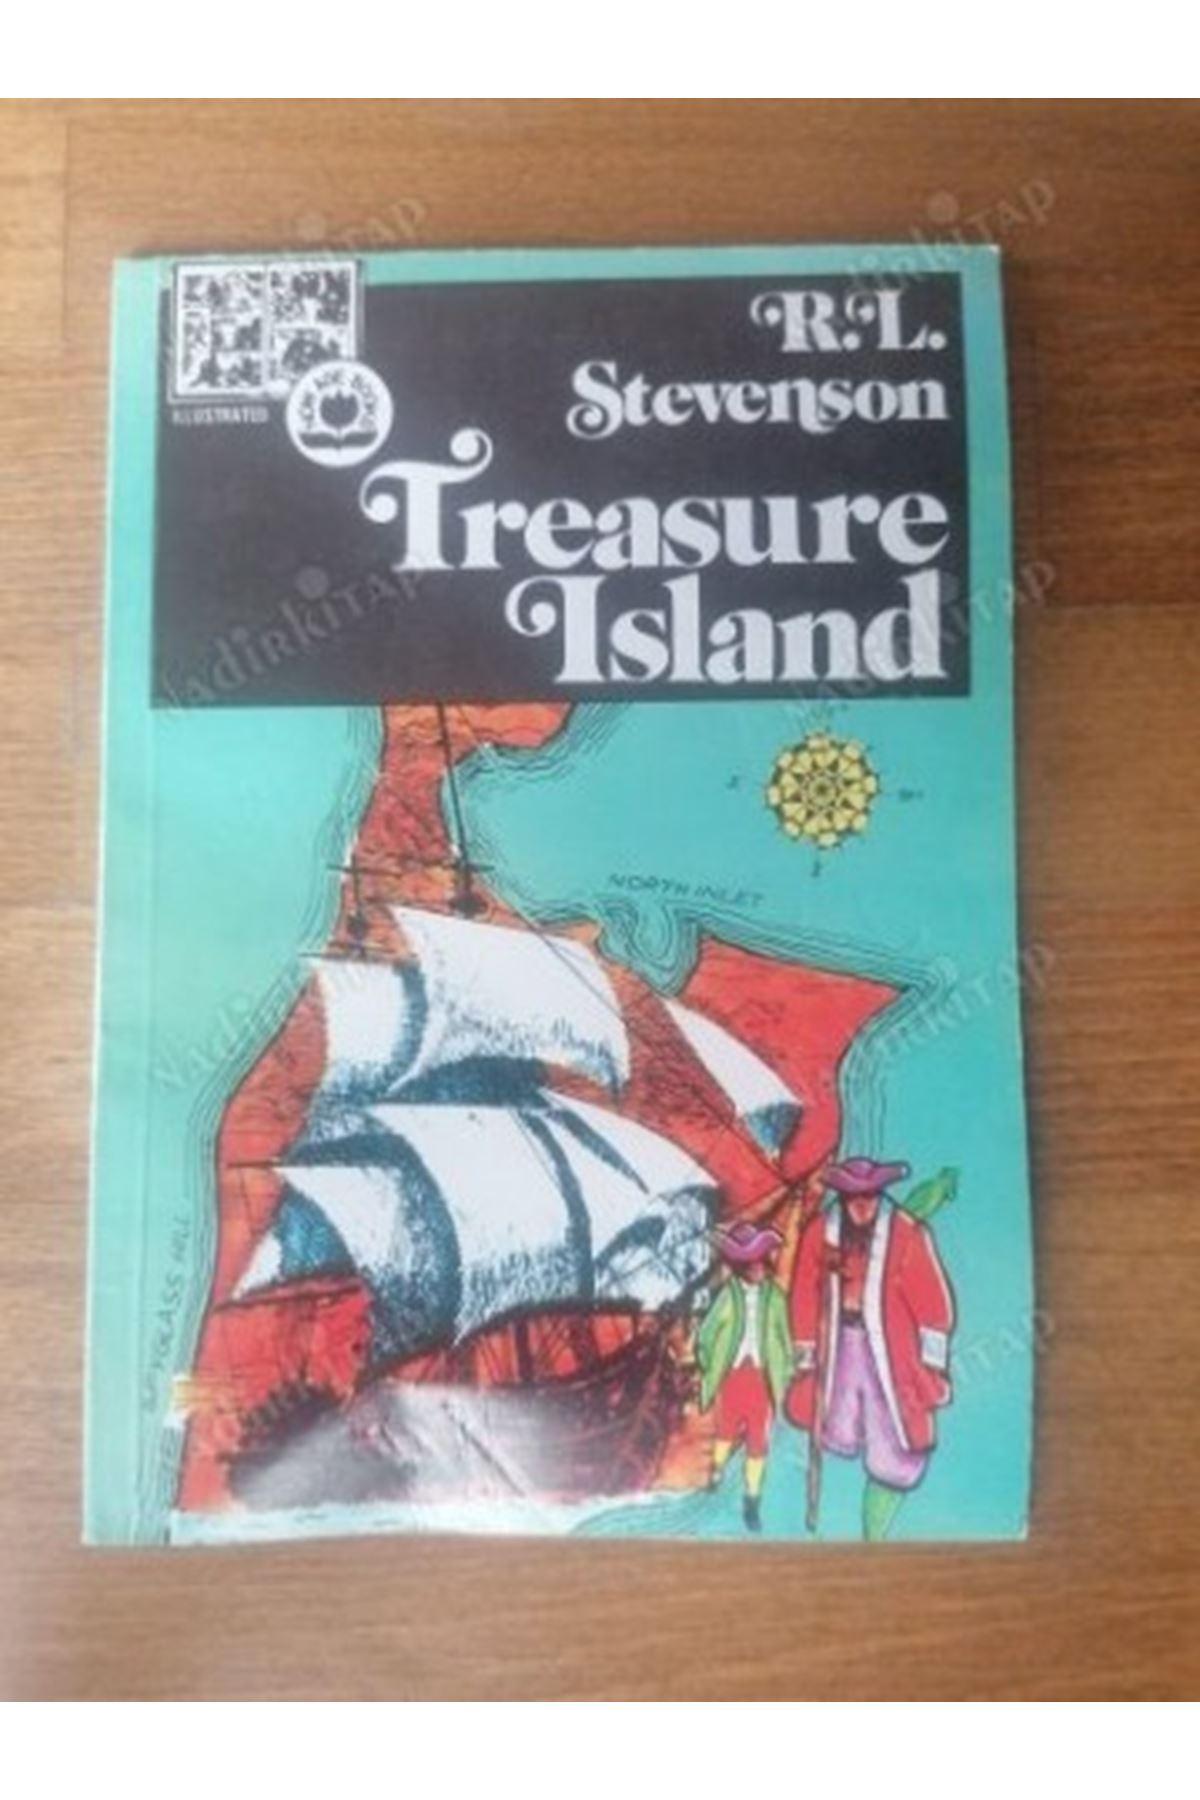 R.L. STEVENSON - TREASURE İSLAND